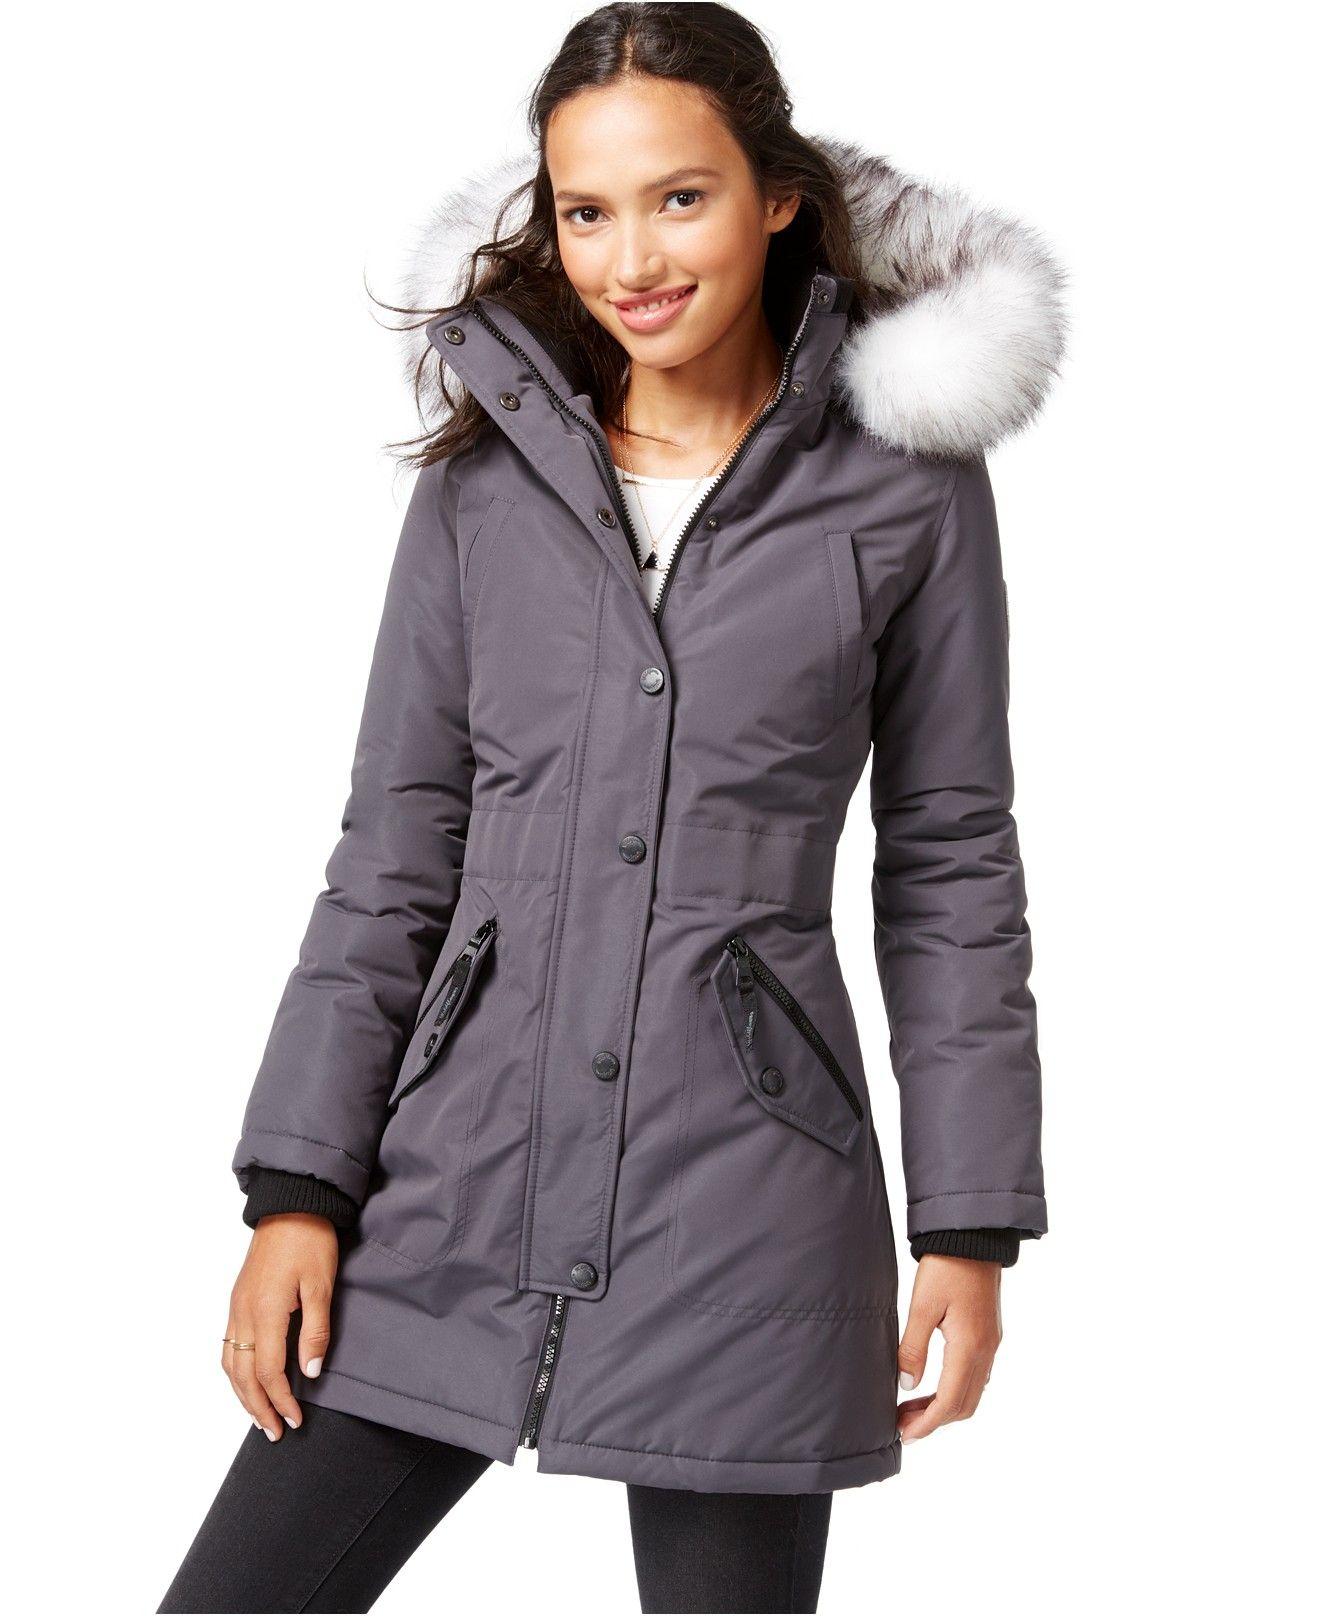 Wildflower Faux Fur Trim Hooded Parka Coats Women Macy S Hooded Parka Coat Coats For Women [ 1616 x 1320 Pixel ]